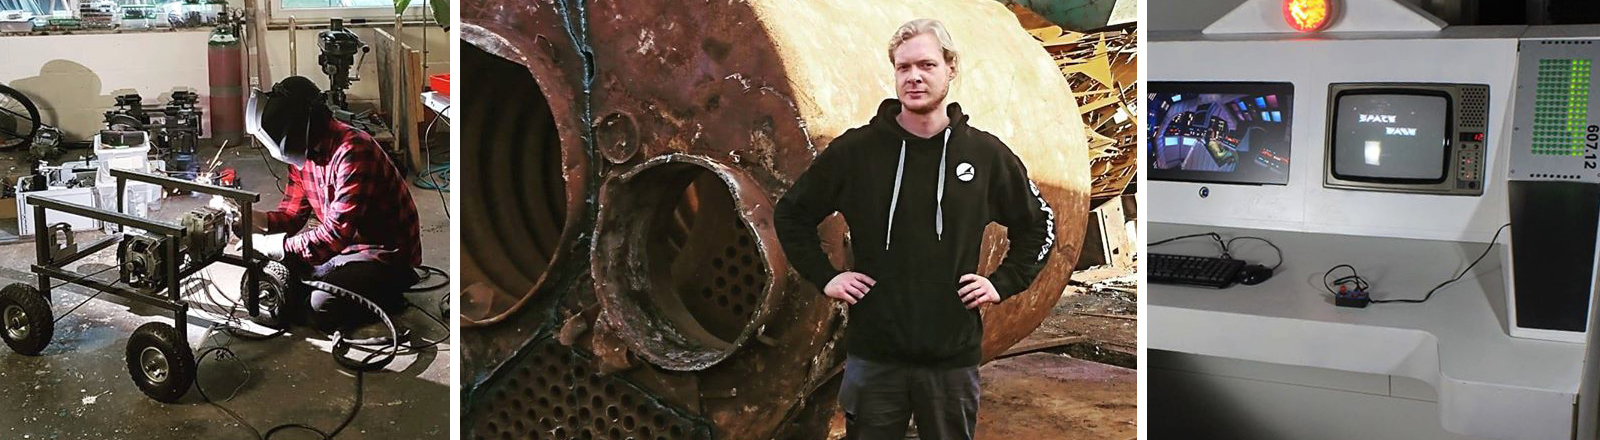 Der selbsternannte Post-Apocalyptic-Inventor Gerolf Kebernik